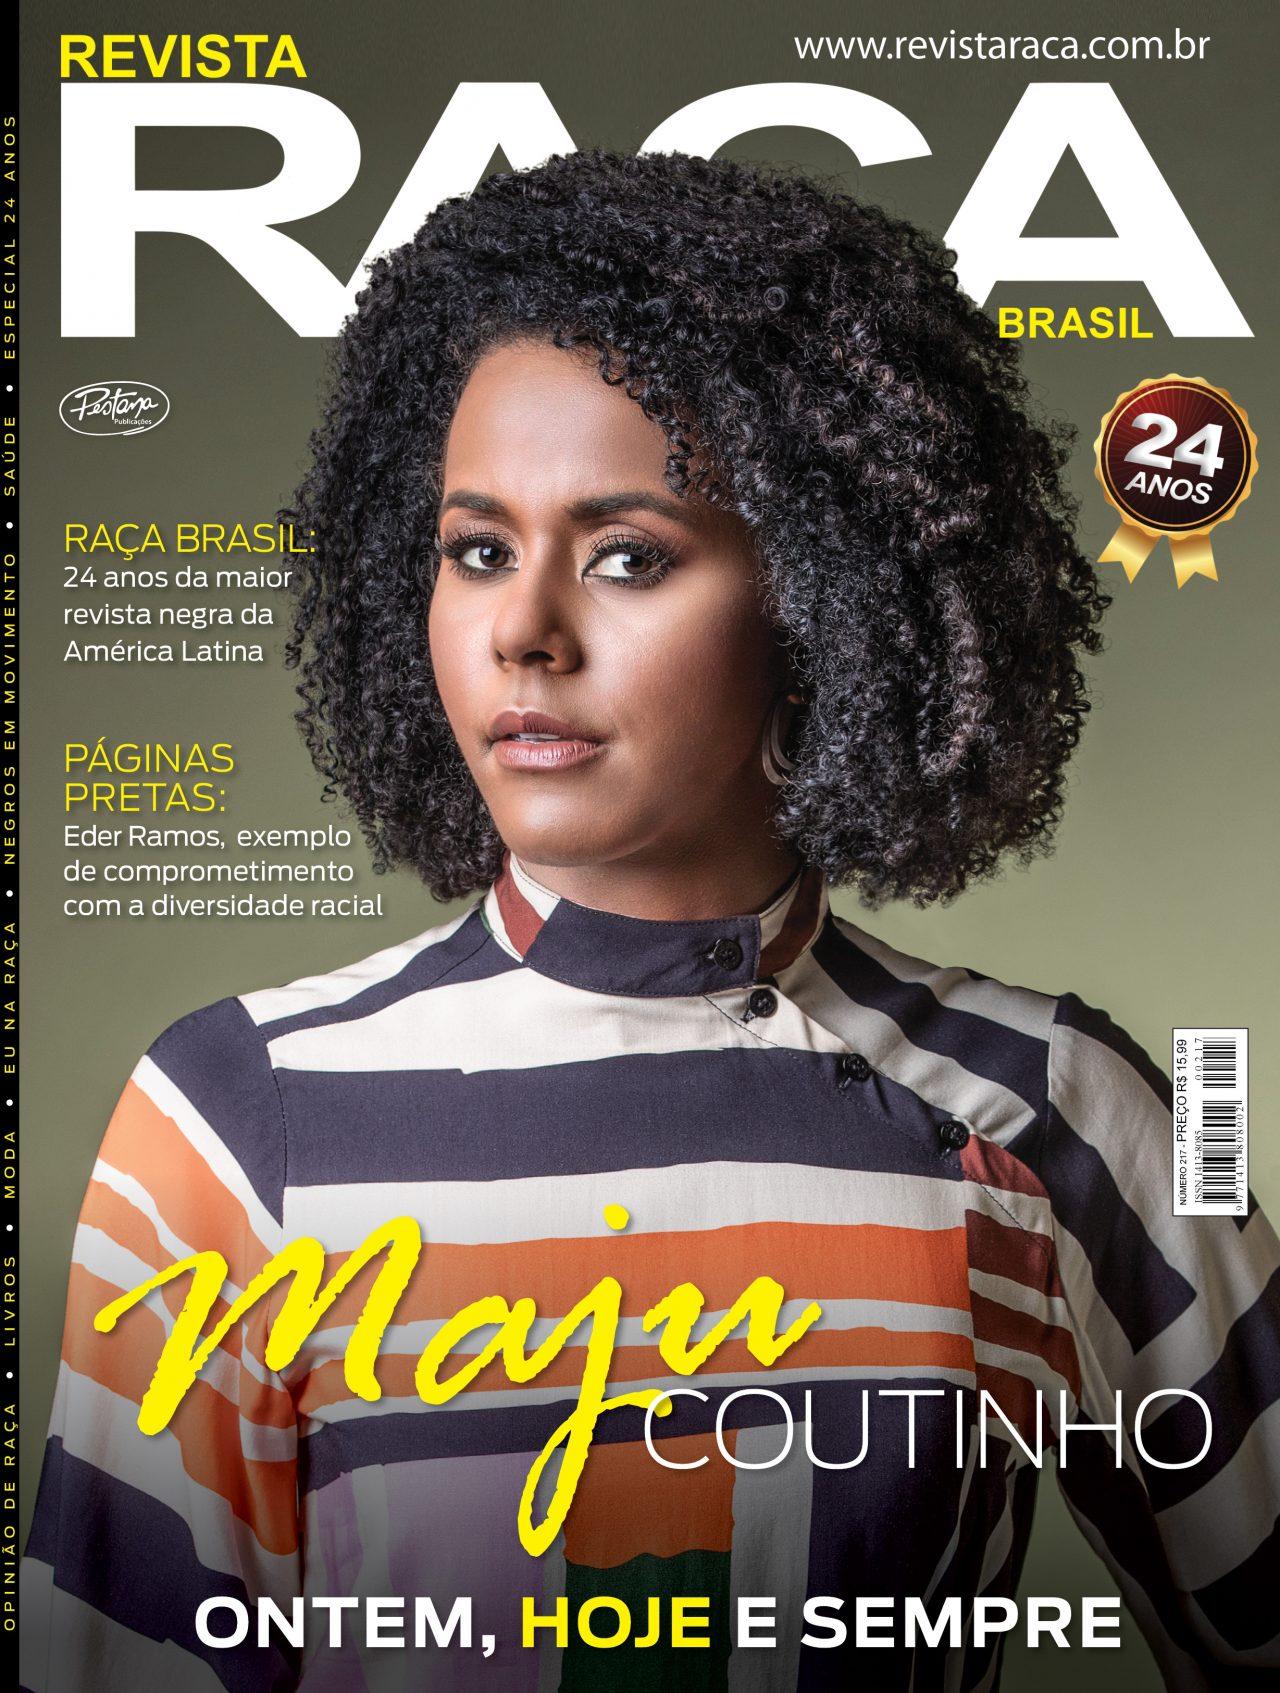 https://revistaraca.com.br/wp-content/uploads/2020/09/capa01-1280x1693.jpg